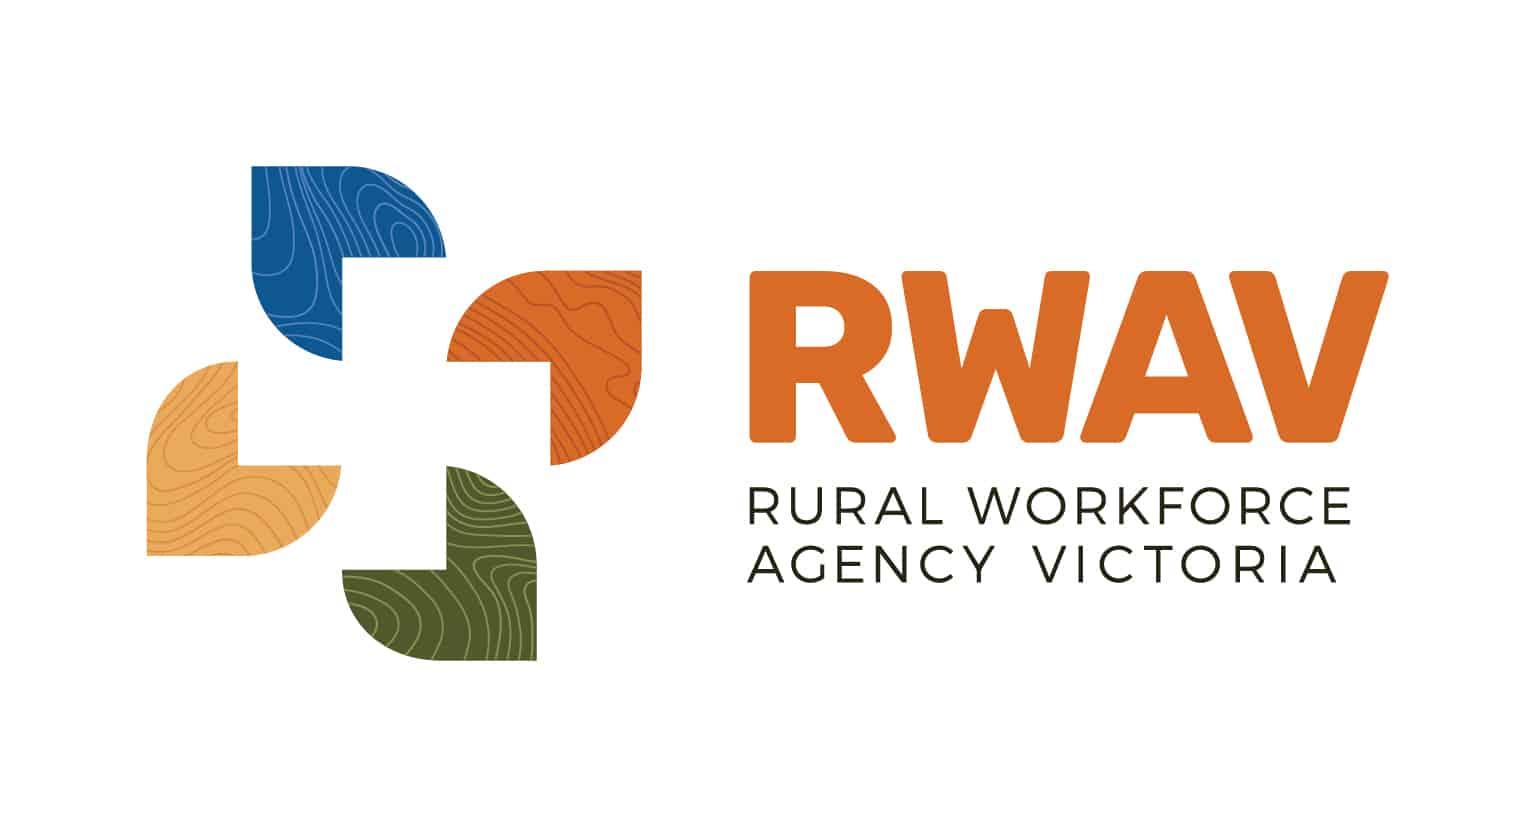 http://www.careersdayout.com.au/wp-content/uploads/2021/05/RWAV-Logo.jpg